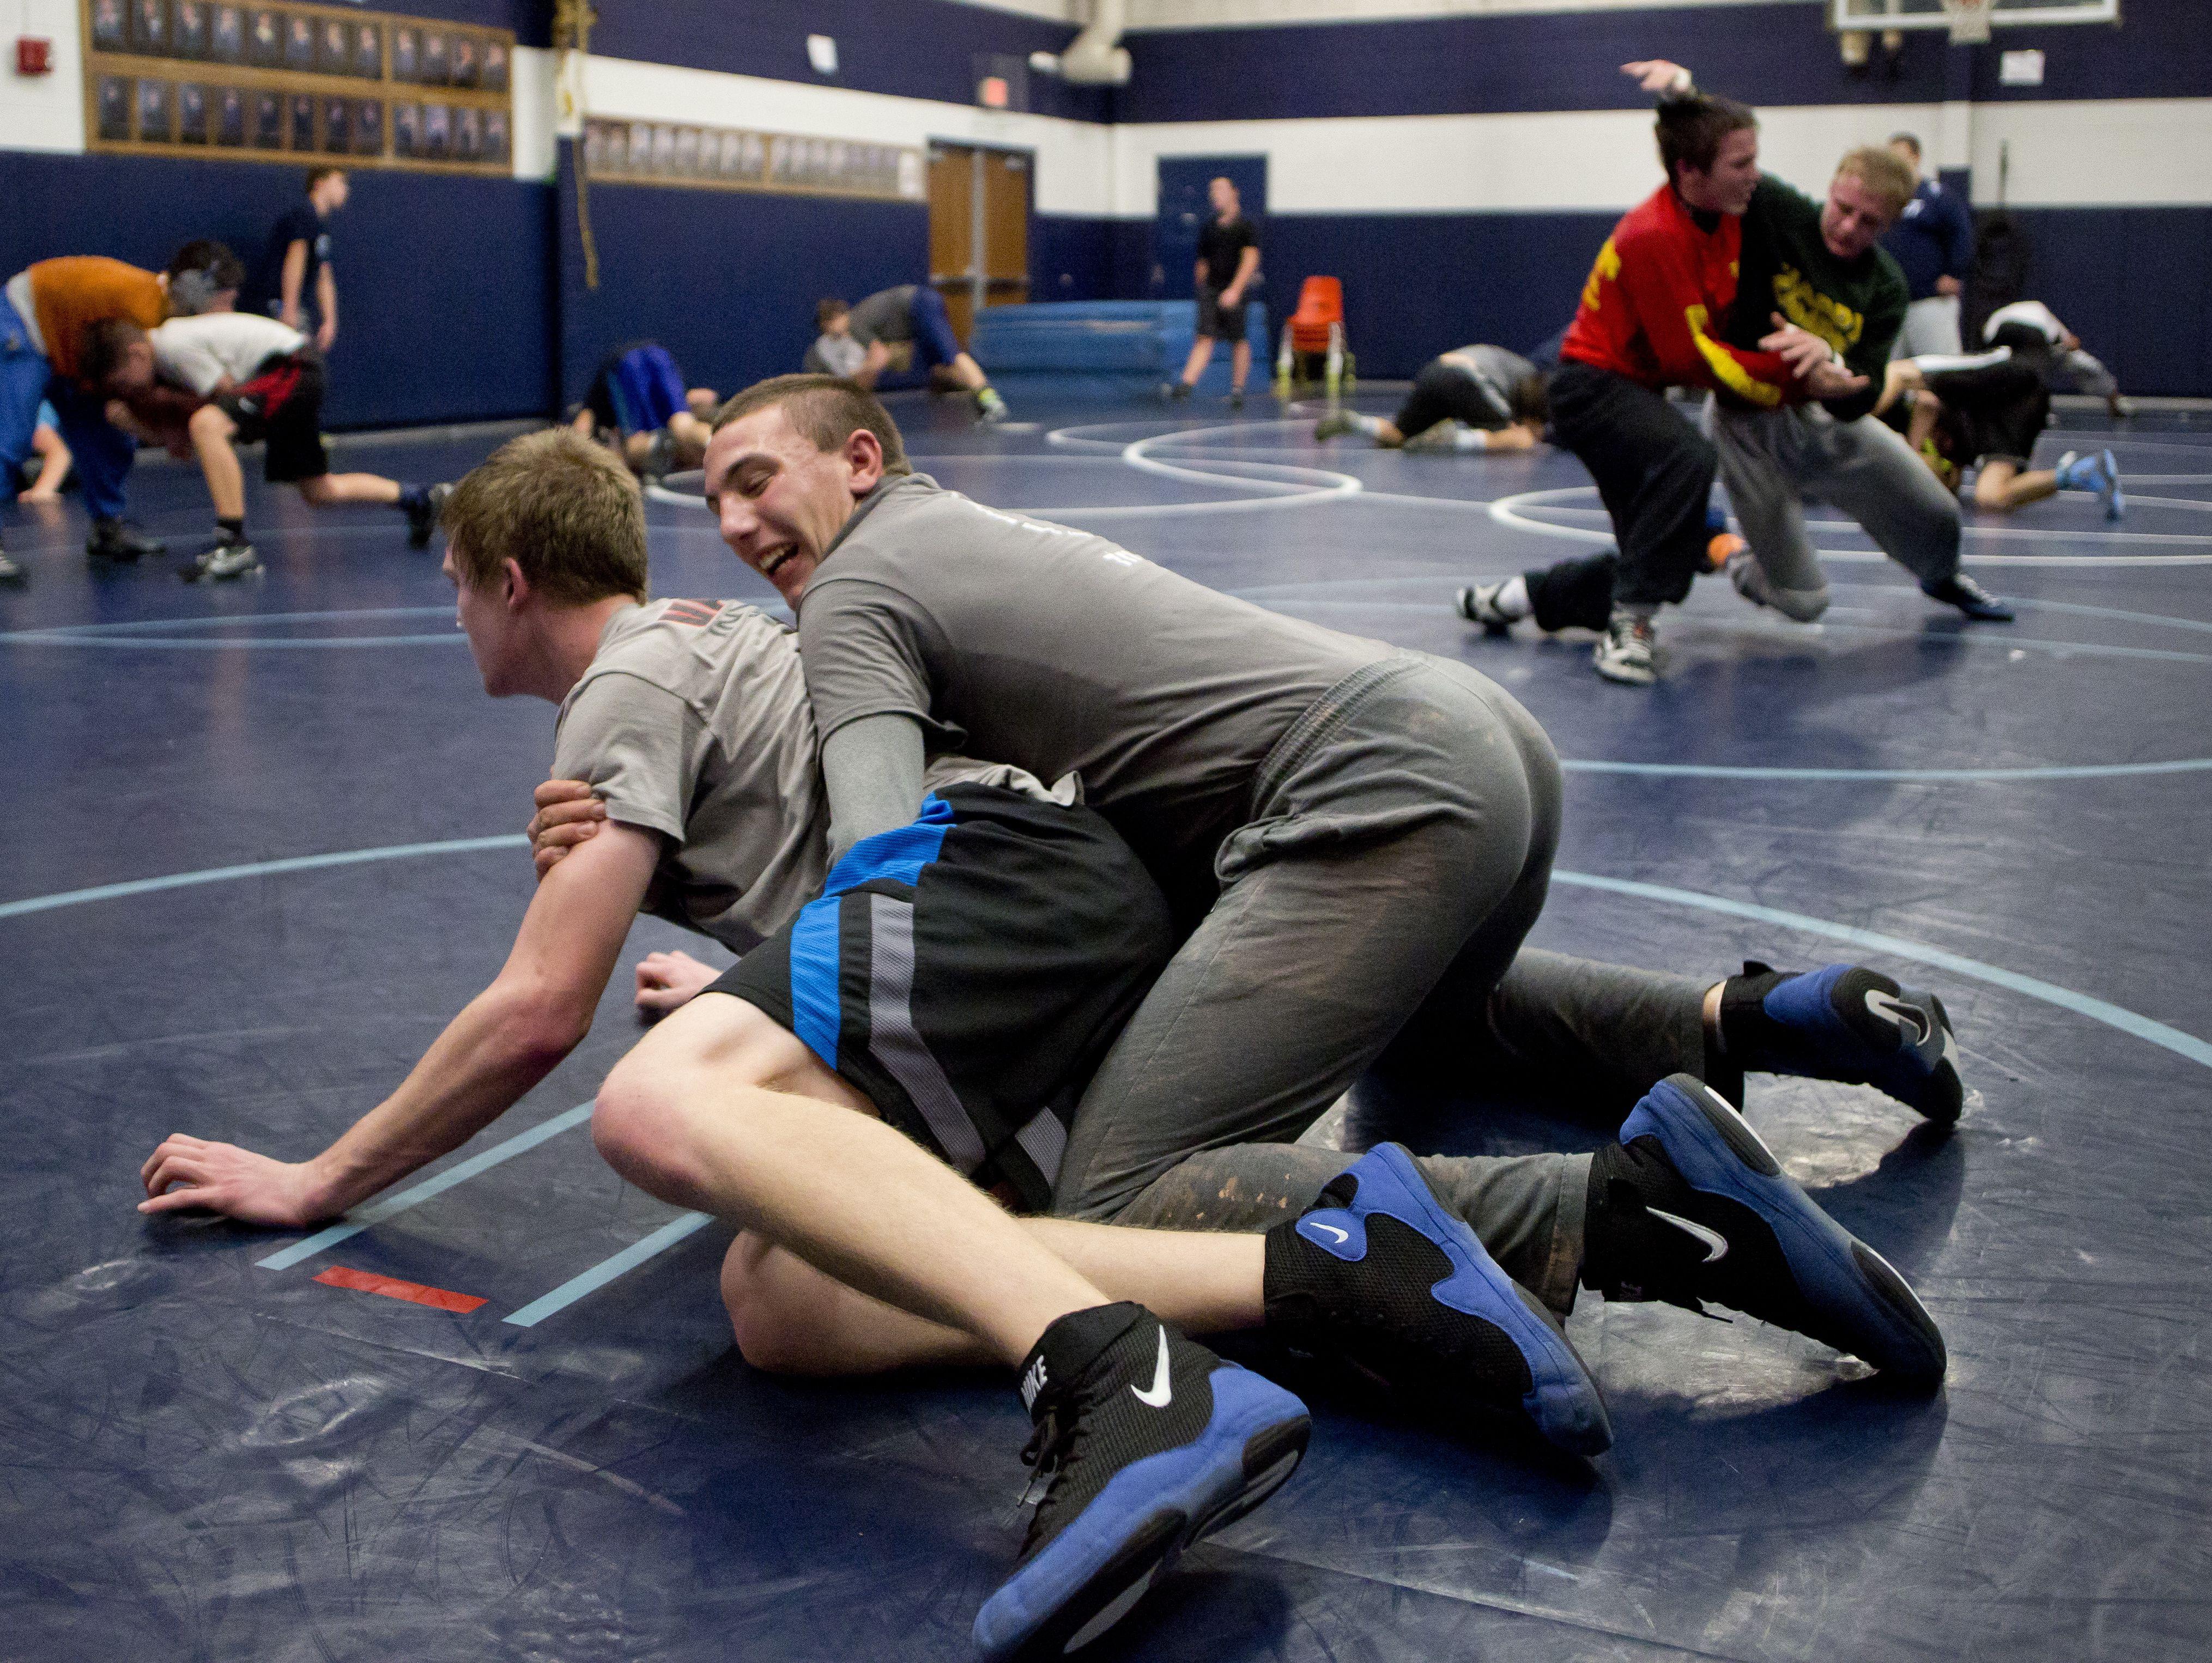 Richmond freshman Ethan Wyatt and sophomore David kaltz wrestle during wrestling practice Friday, Dec. 4, 2015 at Richmond High School.